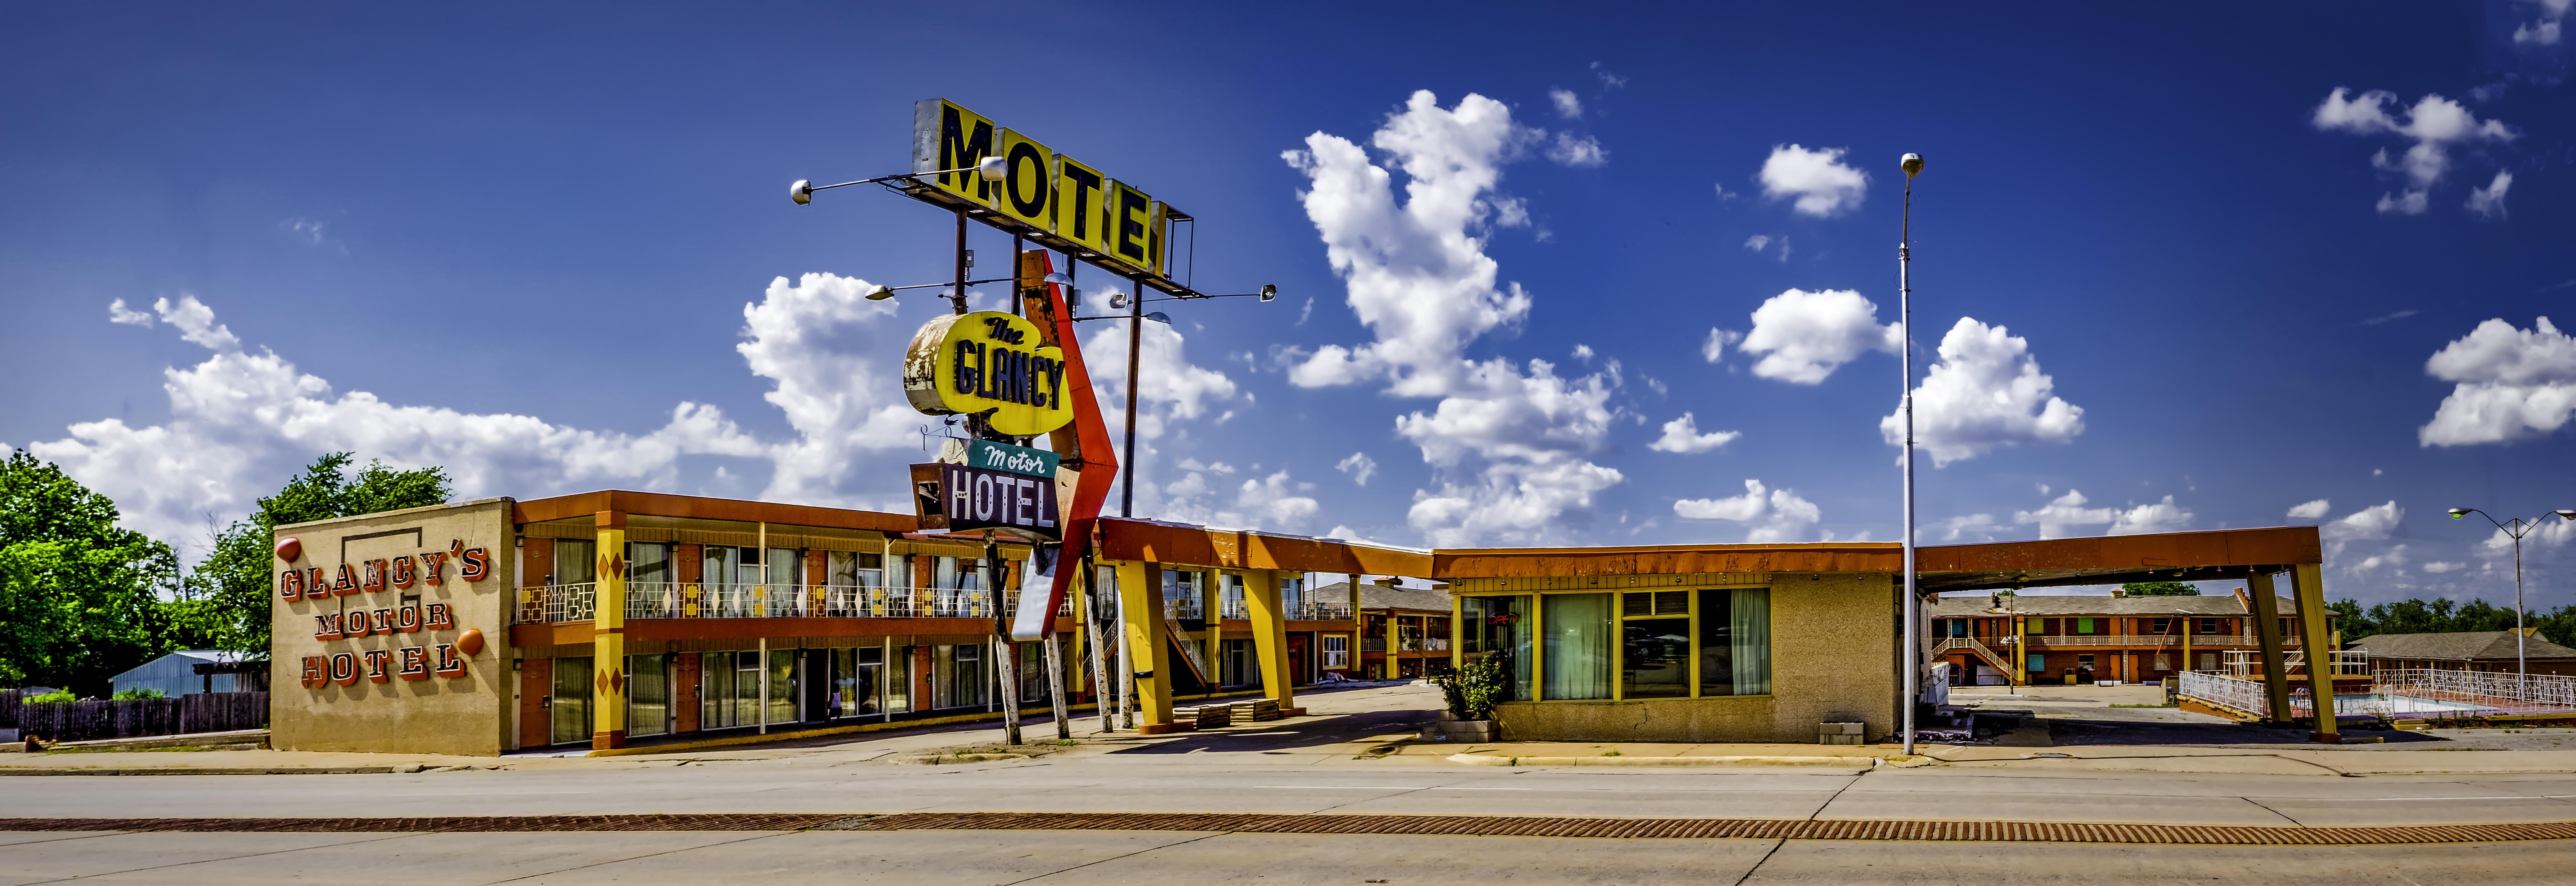 The Glancy Motor Hotel - 217 West Gary Boulevard, Clinton, Oklahoma U.S.A. - May 24, 2018